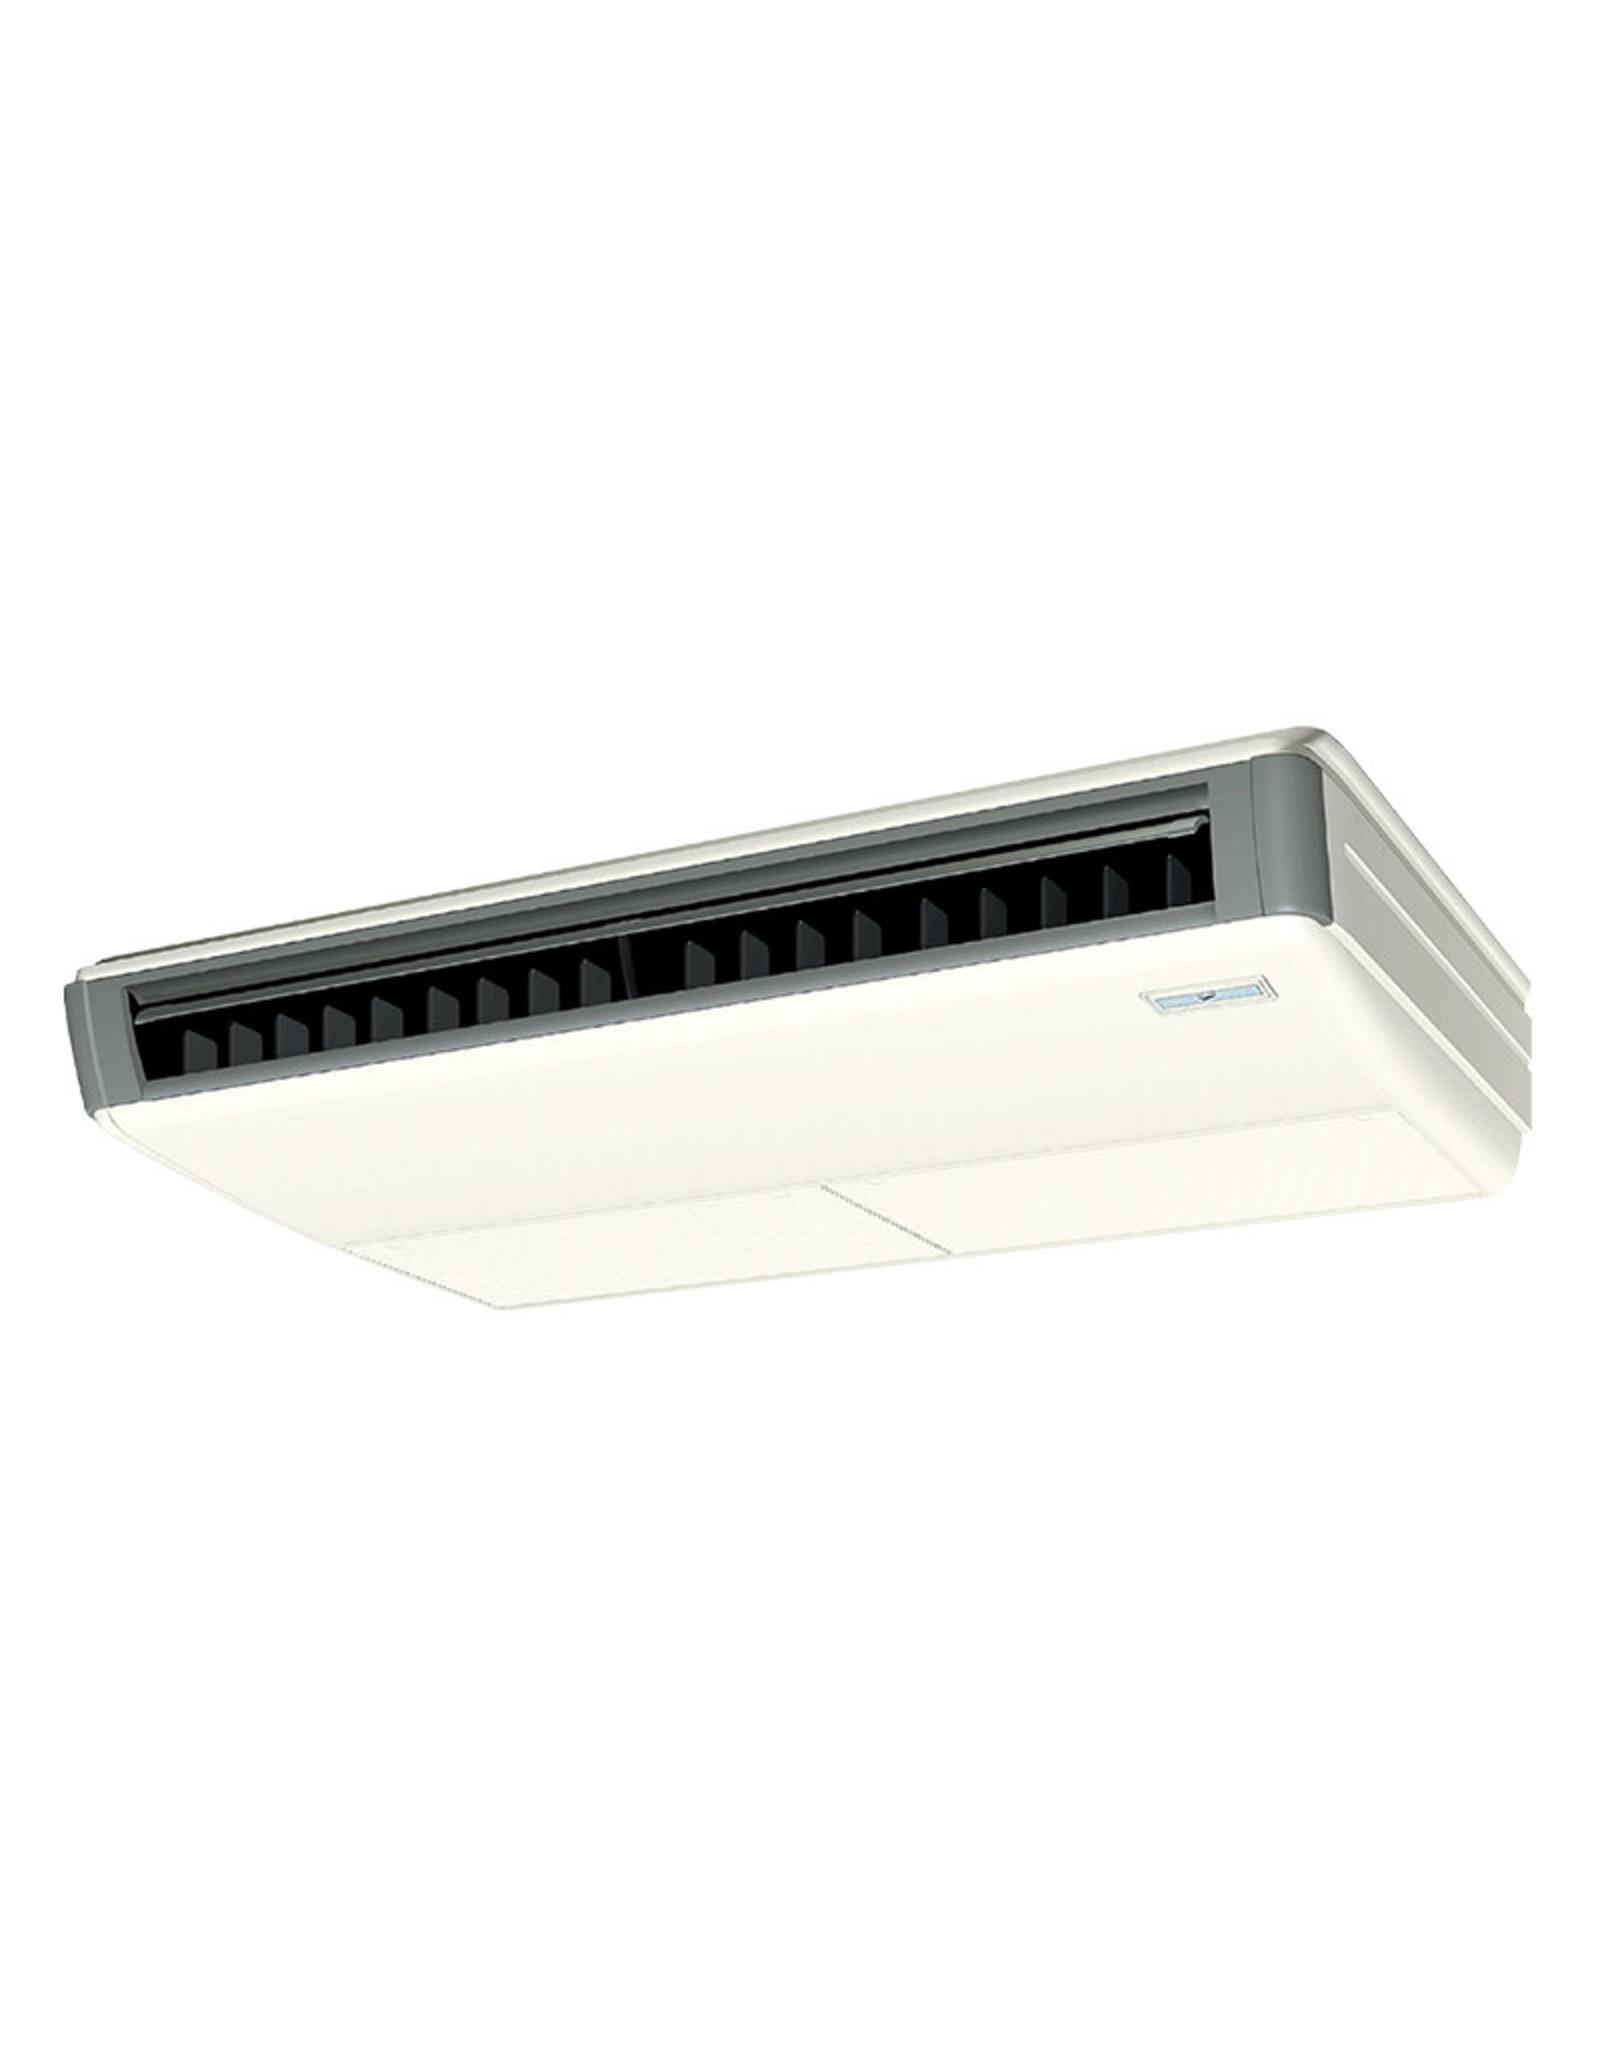 Daikin Applied Americas SkyAir FHQ Cooling/HeatPump Single Zone Ceiling-Suspended AHU - 208/230 - 1ph